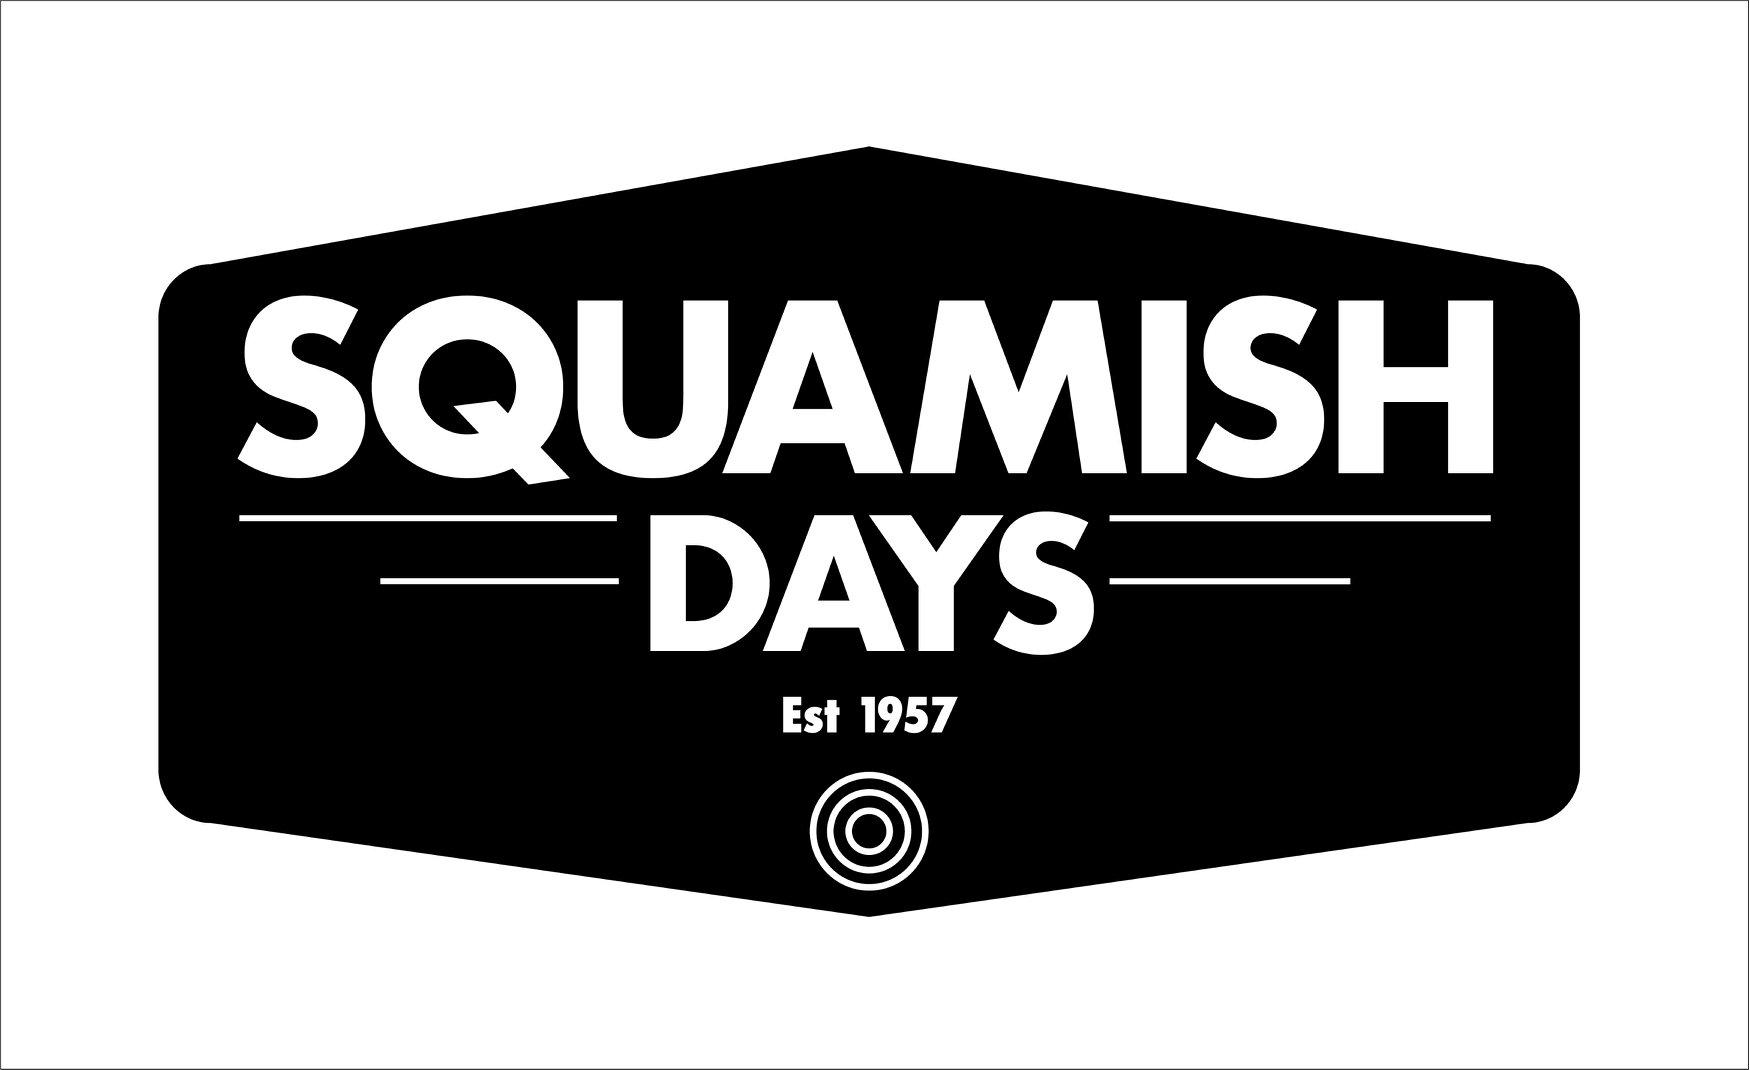 Squamish Days Loggers Sports, Squamish BC